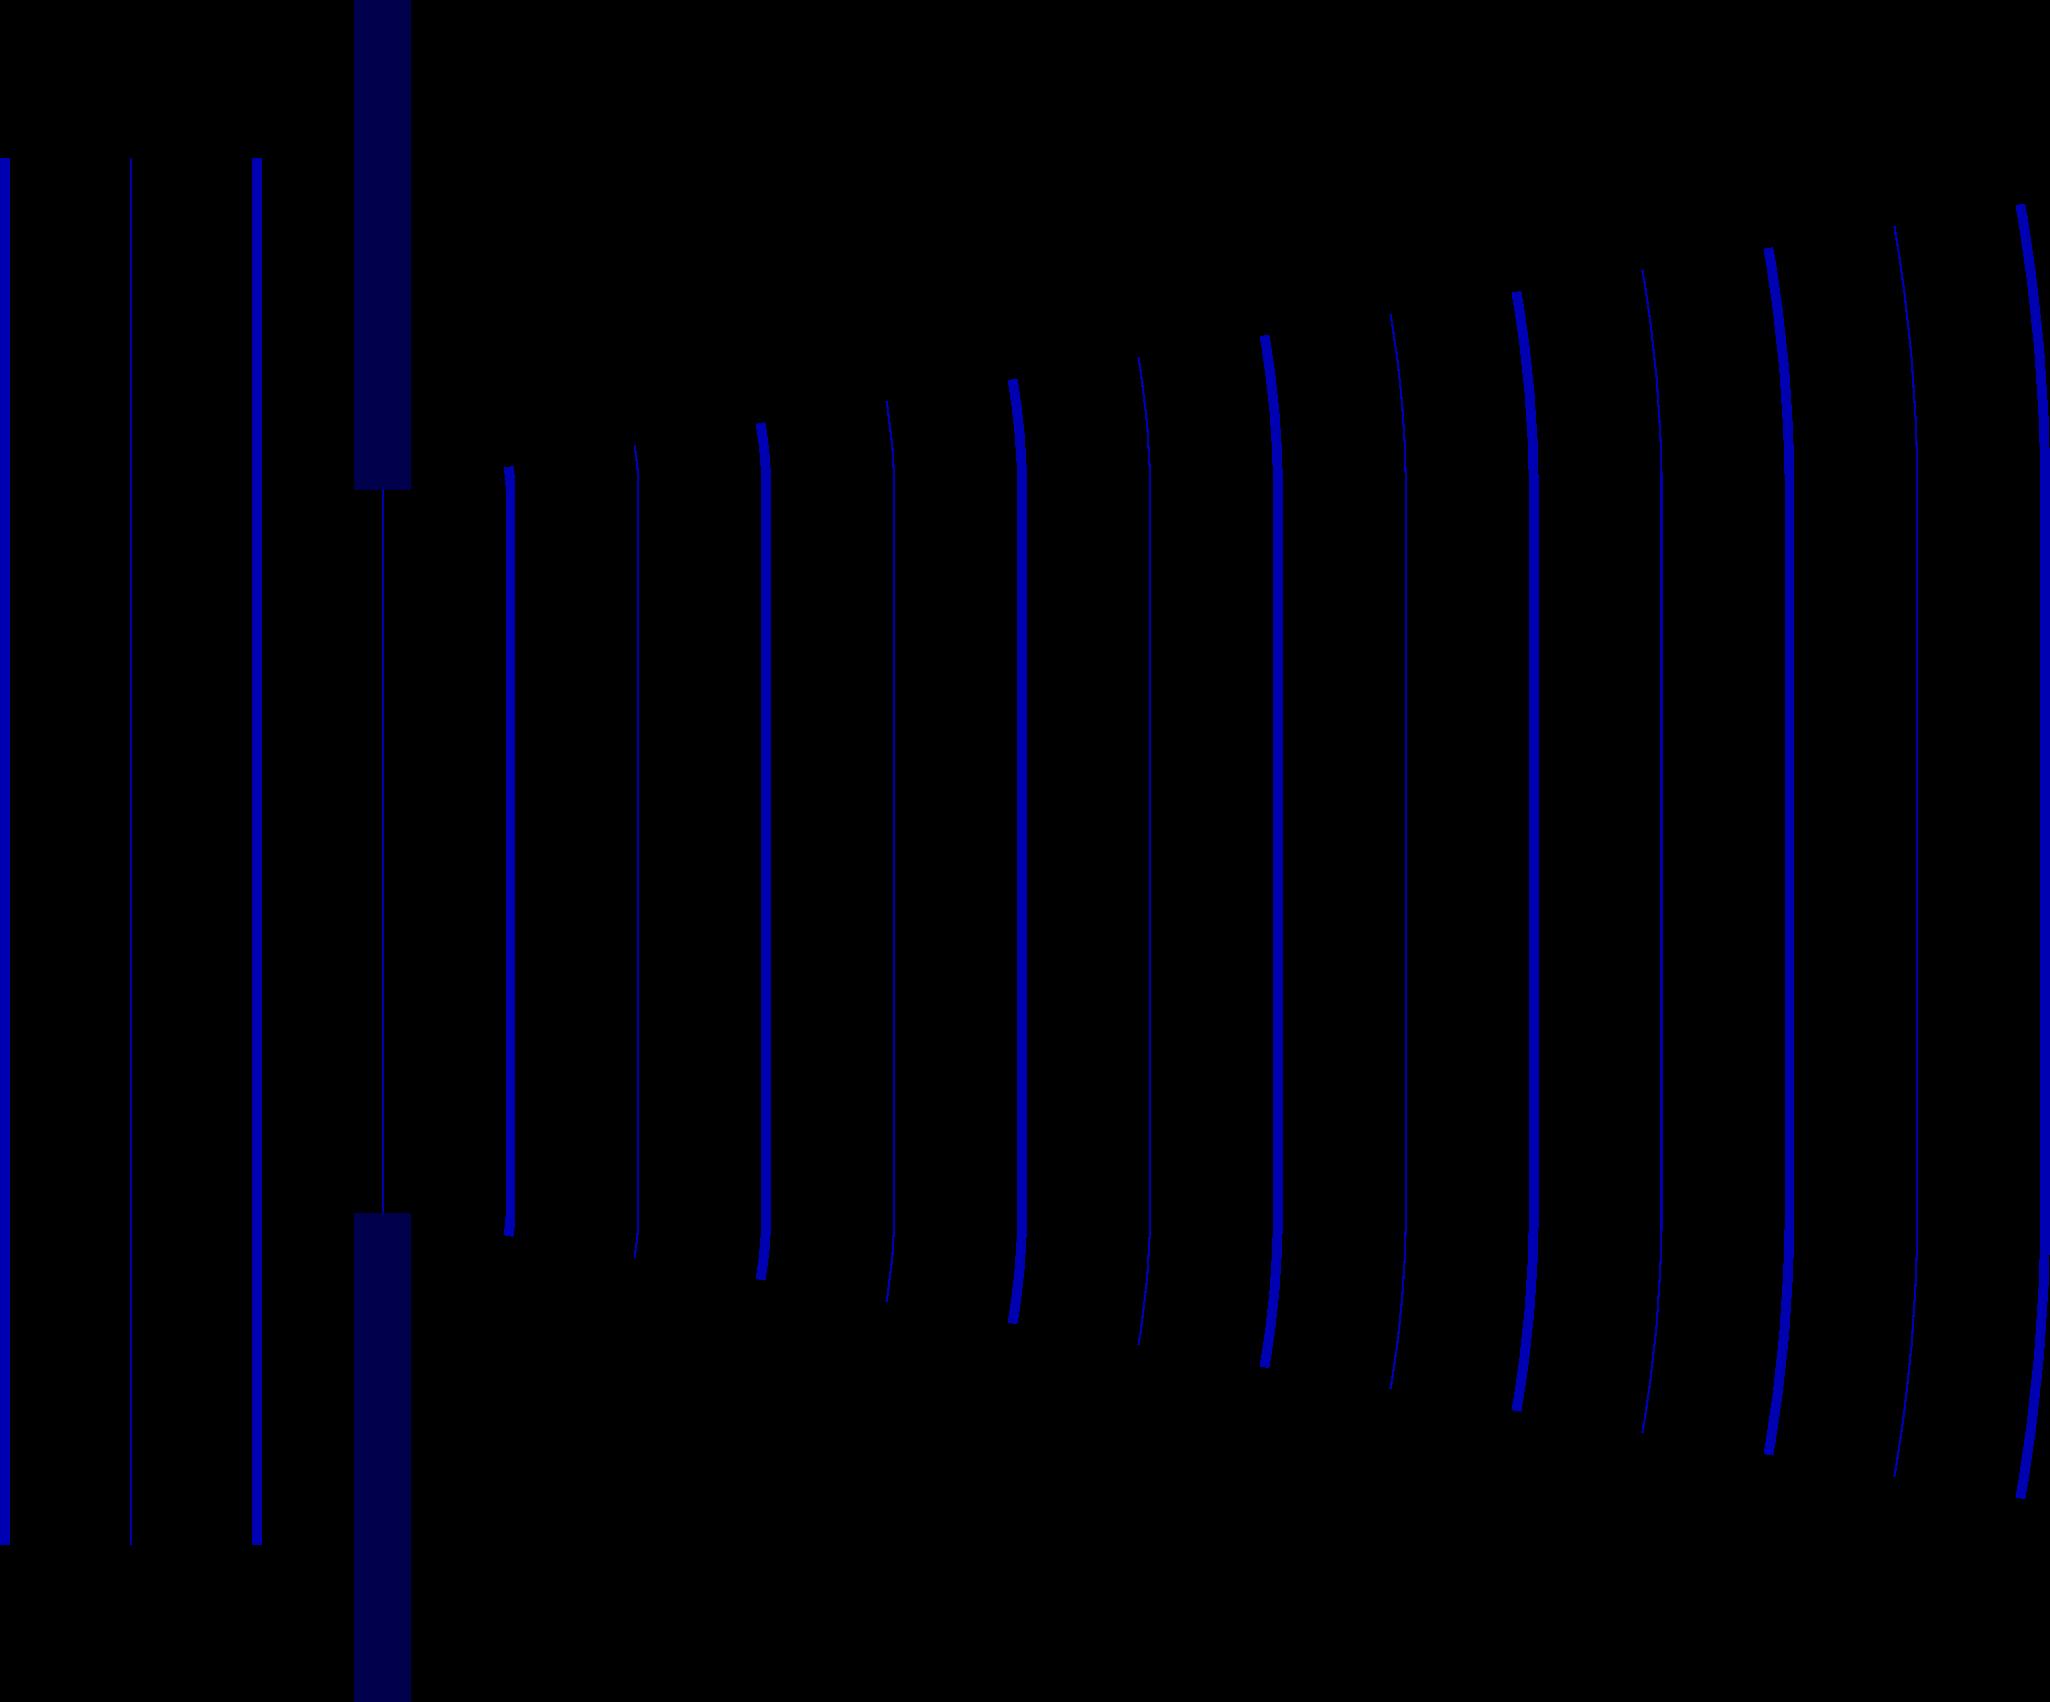 optics_diffraction-003.png